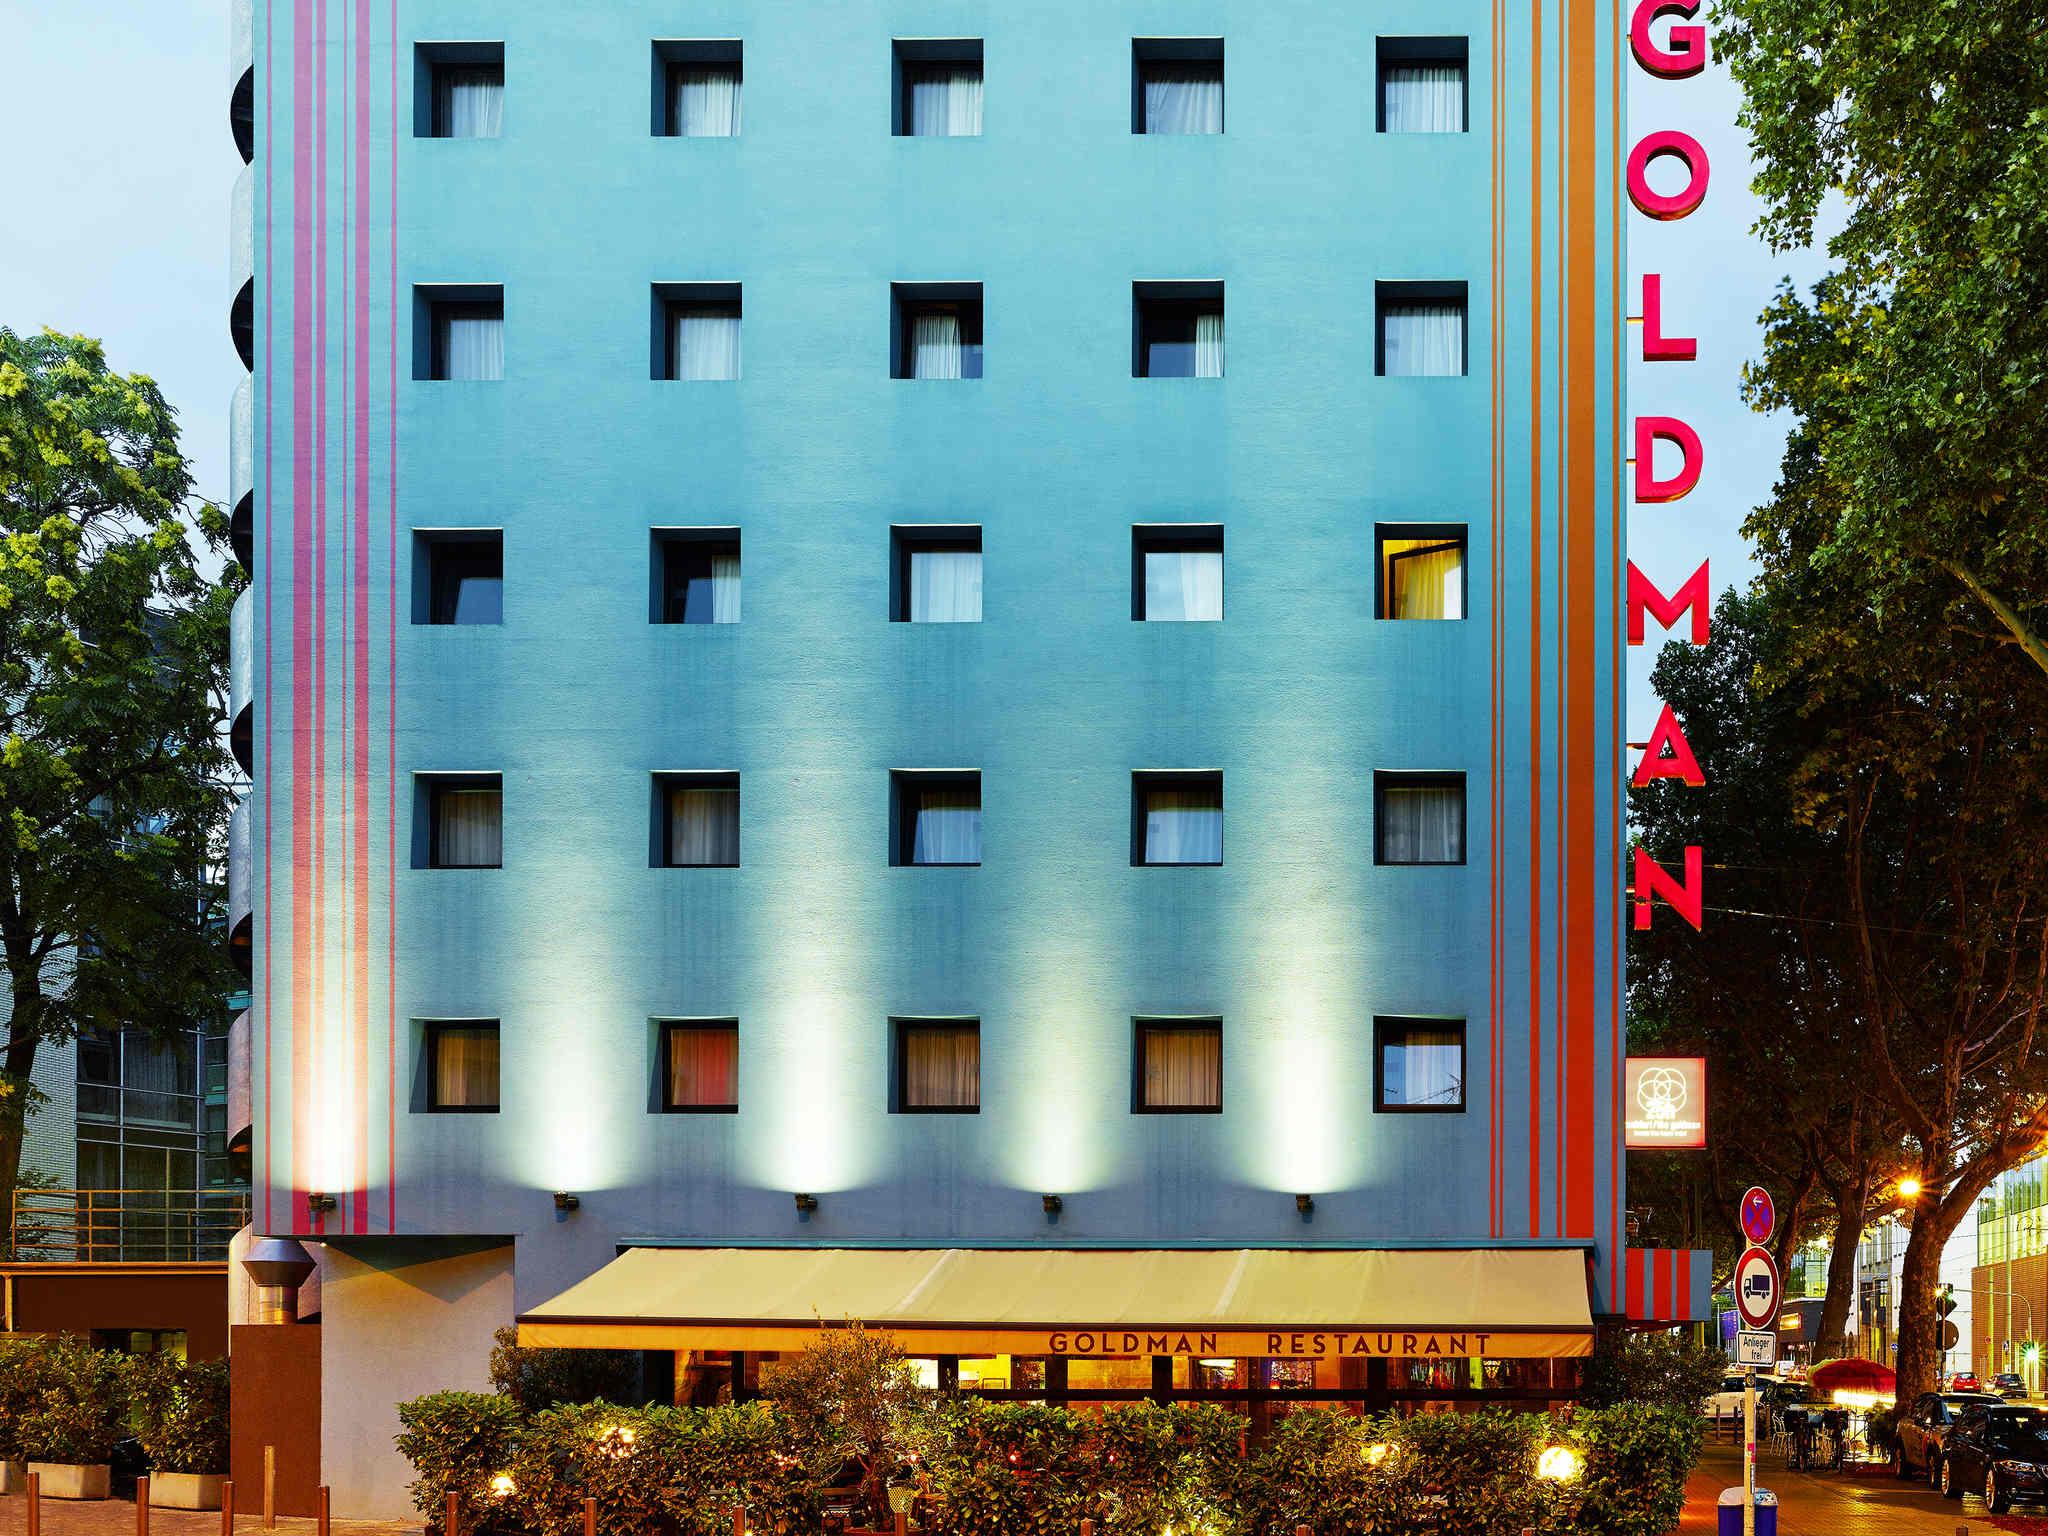 Hotel In Frankfurt Am Main 25hours Hotel Frankfurt The Goldman